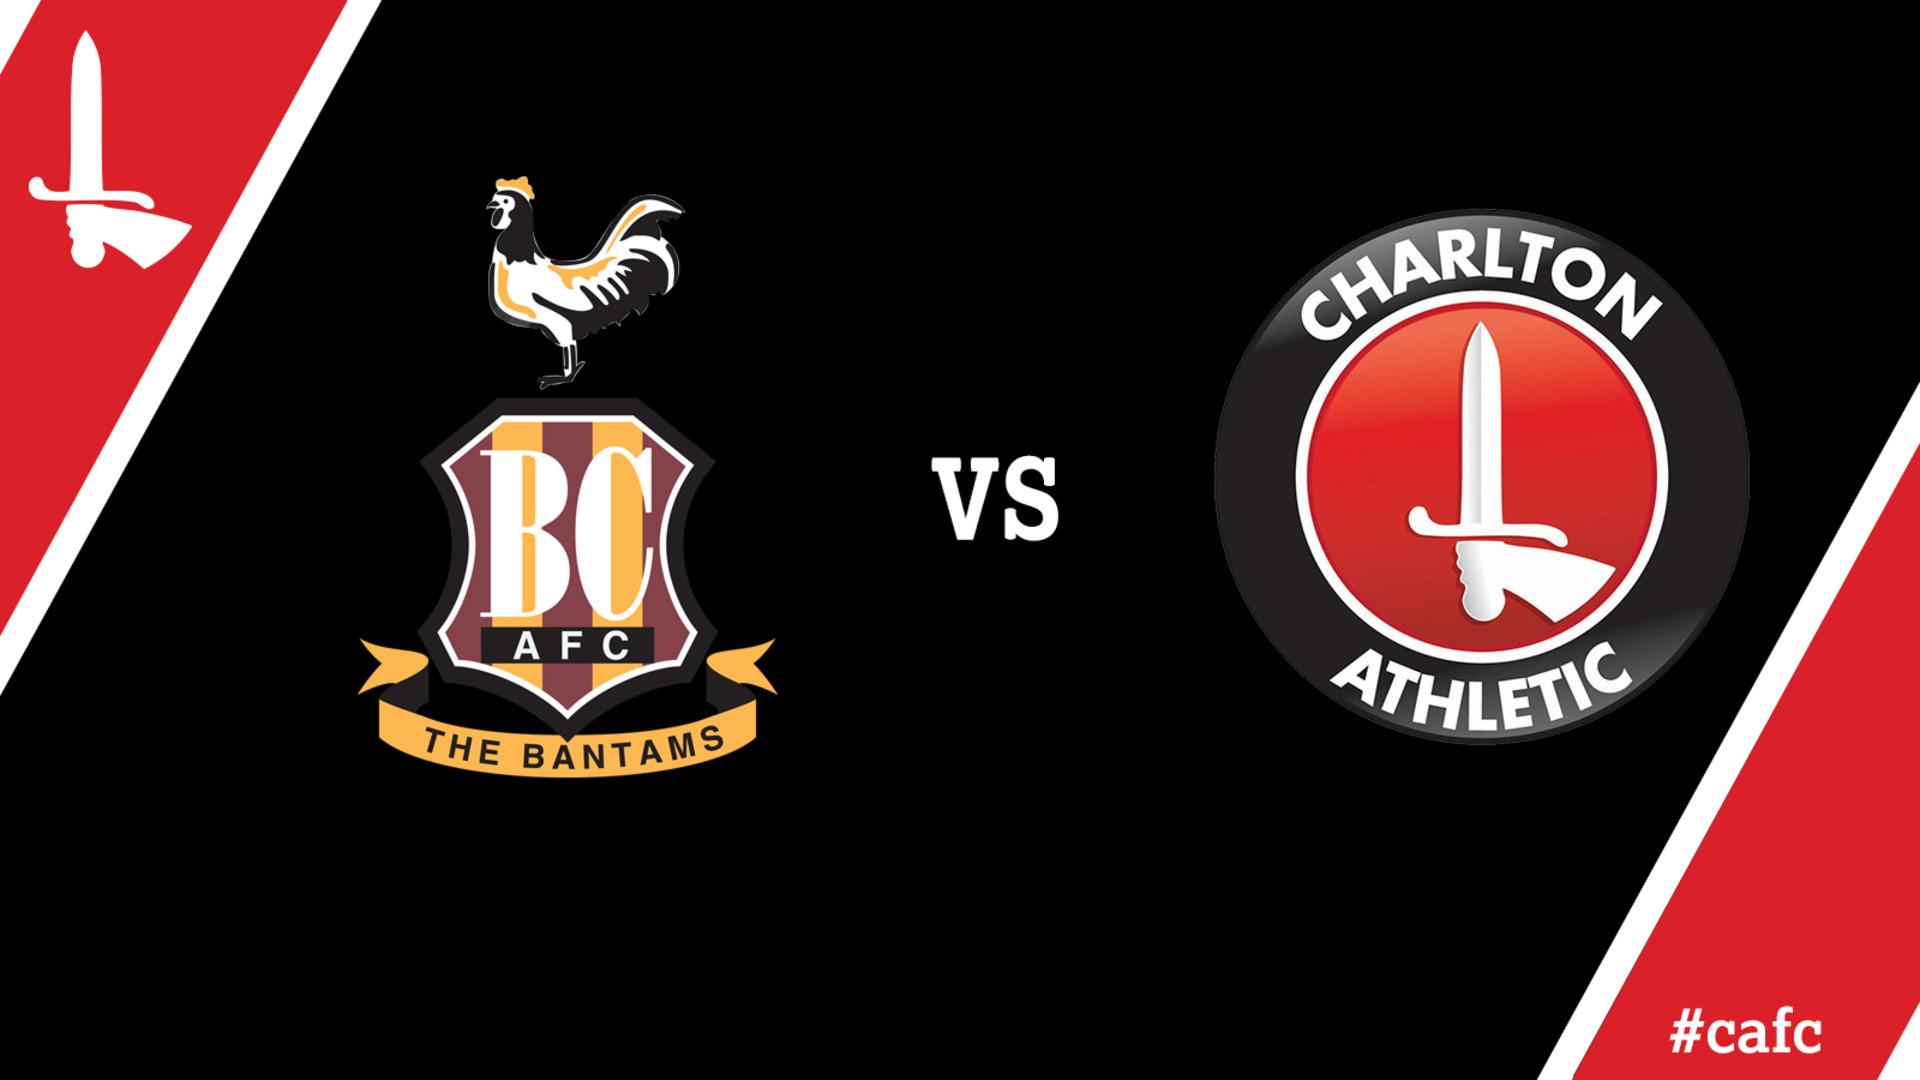 LIVE COMMENTARY | Bradford Vs Charlton